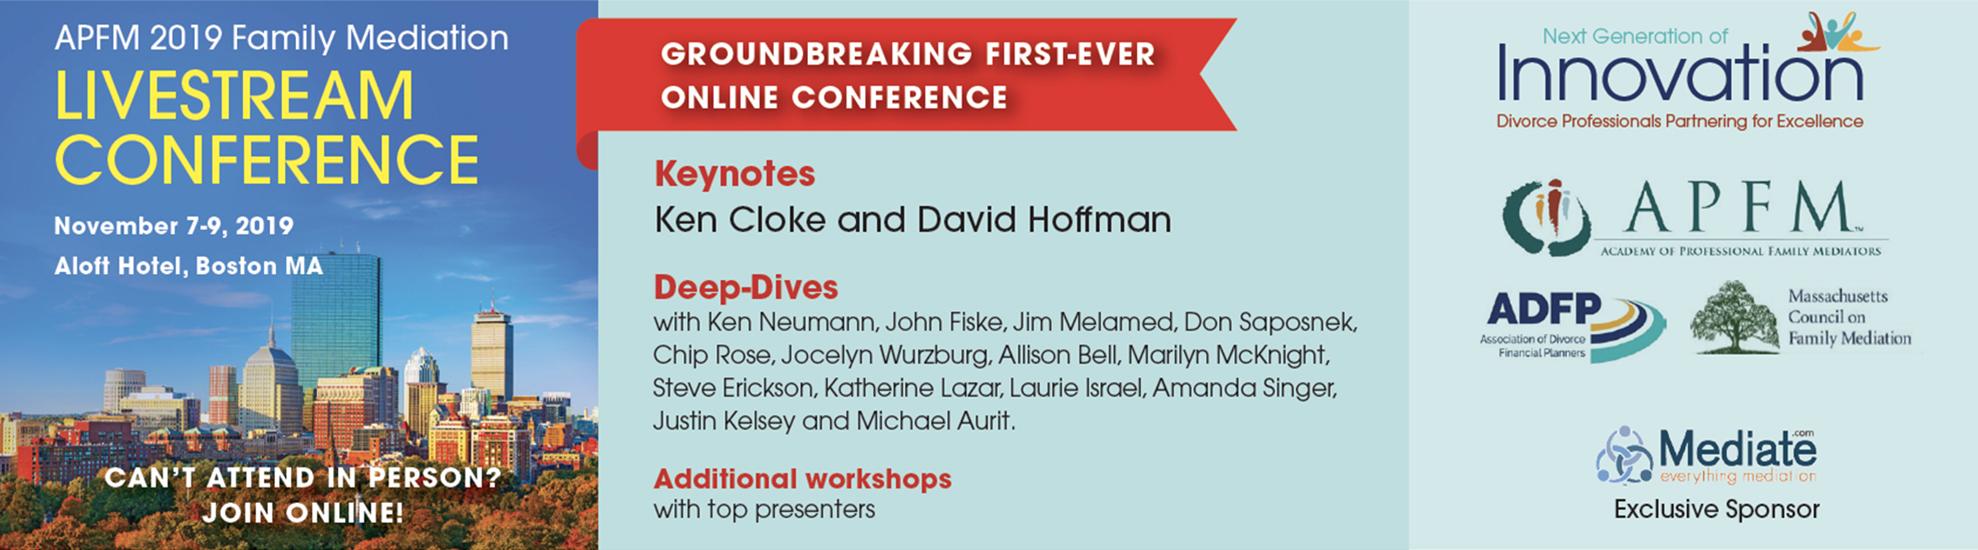 livestream conference banner